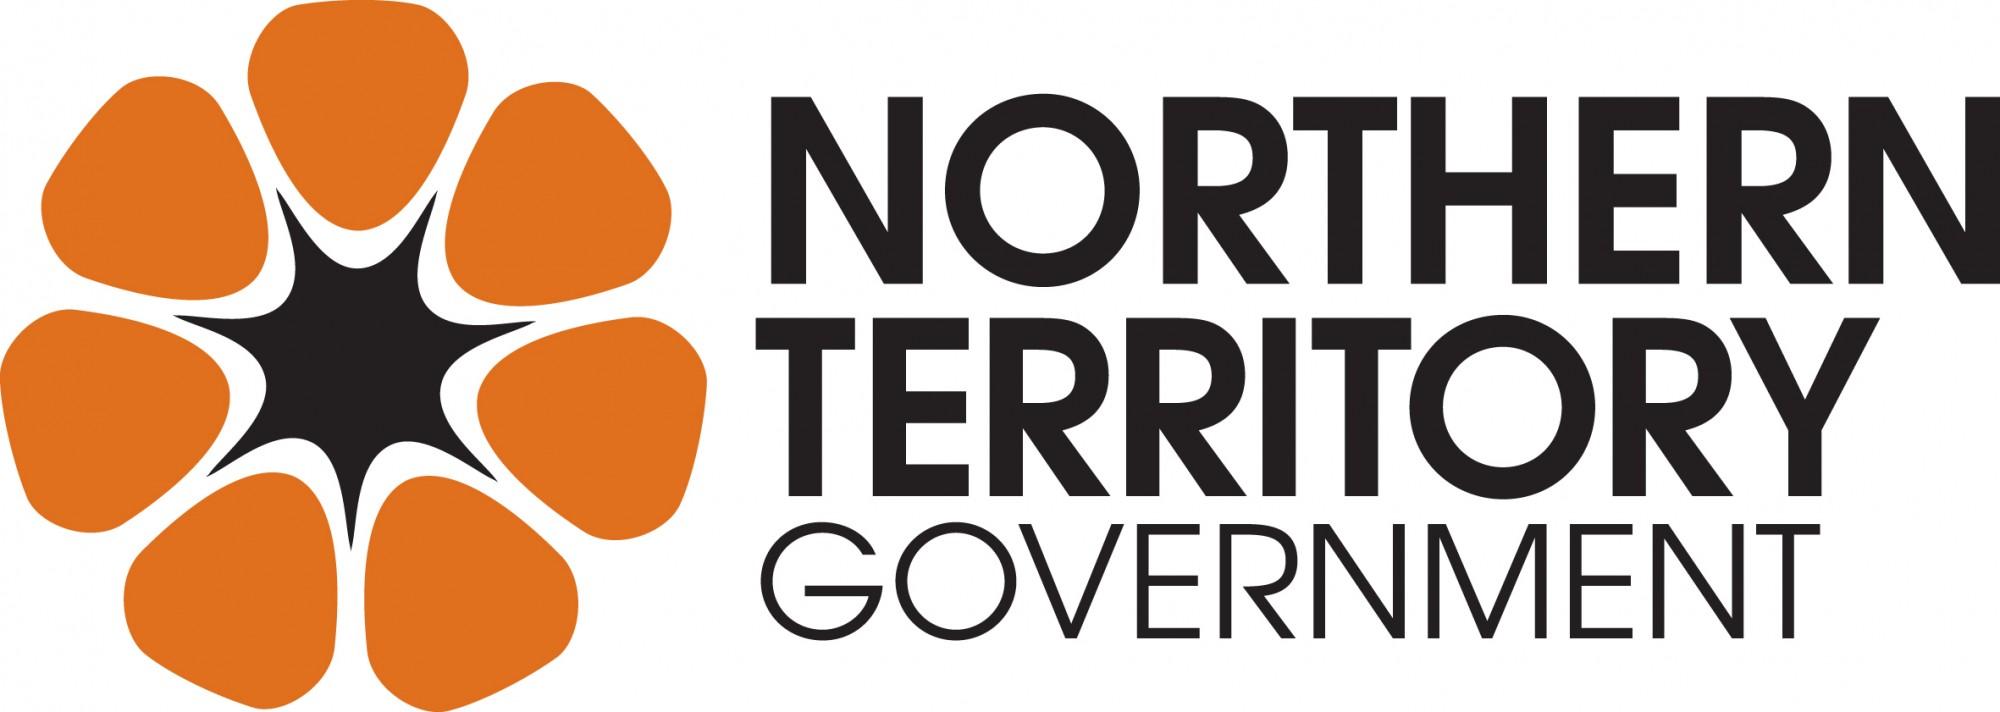 northern-territory-government-logo.jpg